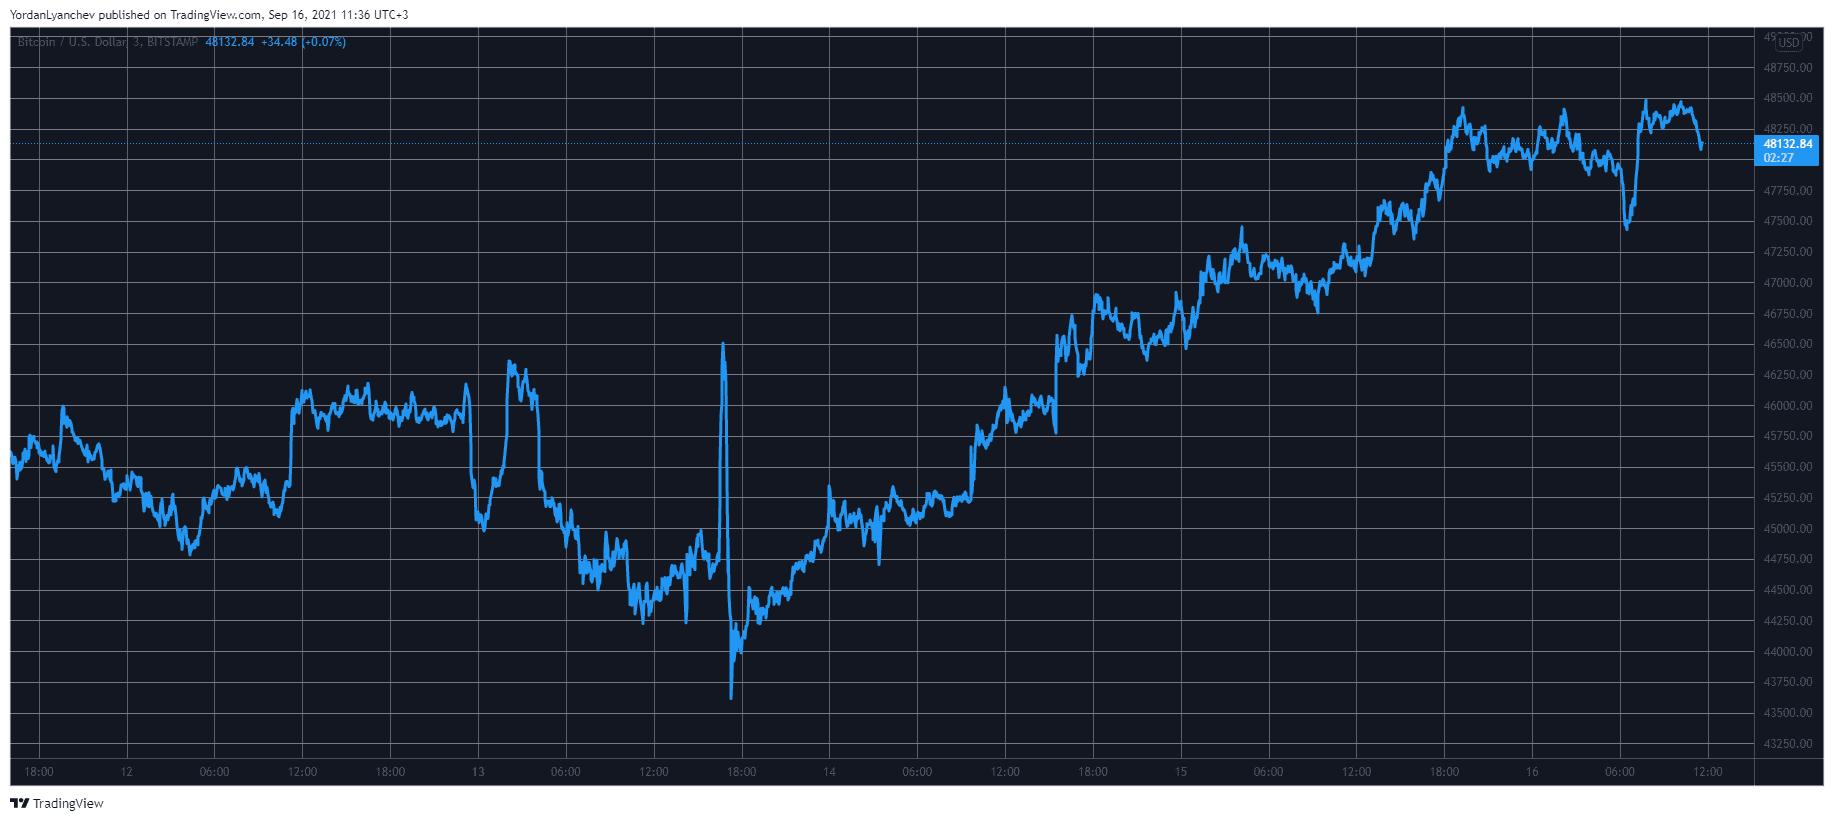 Ethereum (ETH) Skyrockets 18% in 3 Days as Bitcoin Taps $48K (Market Watch)